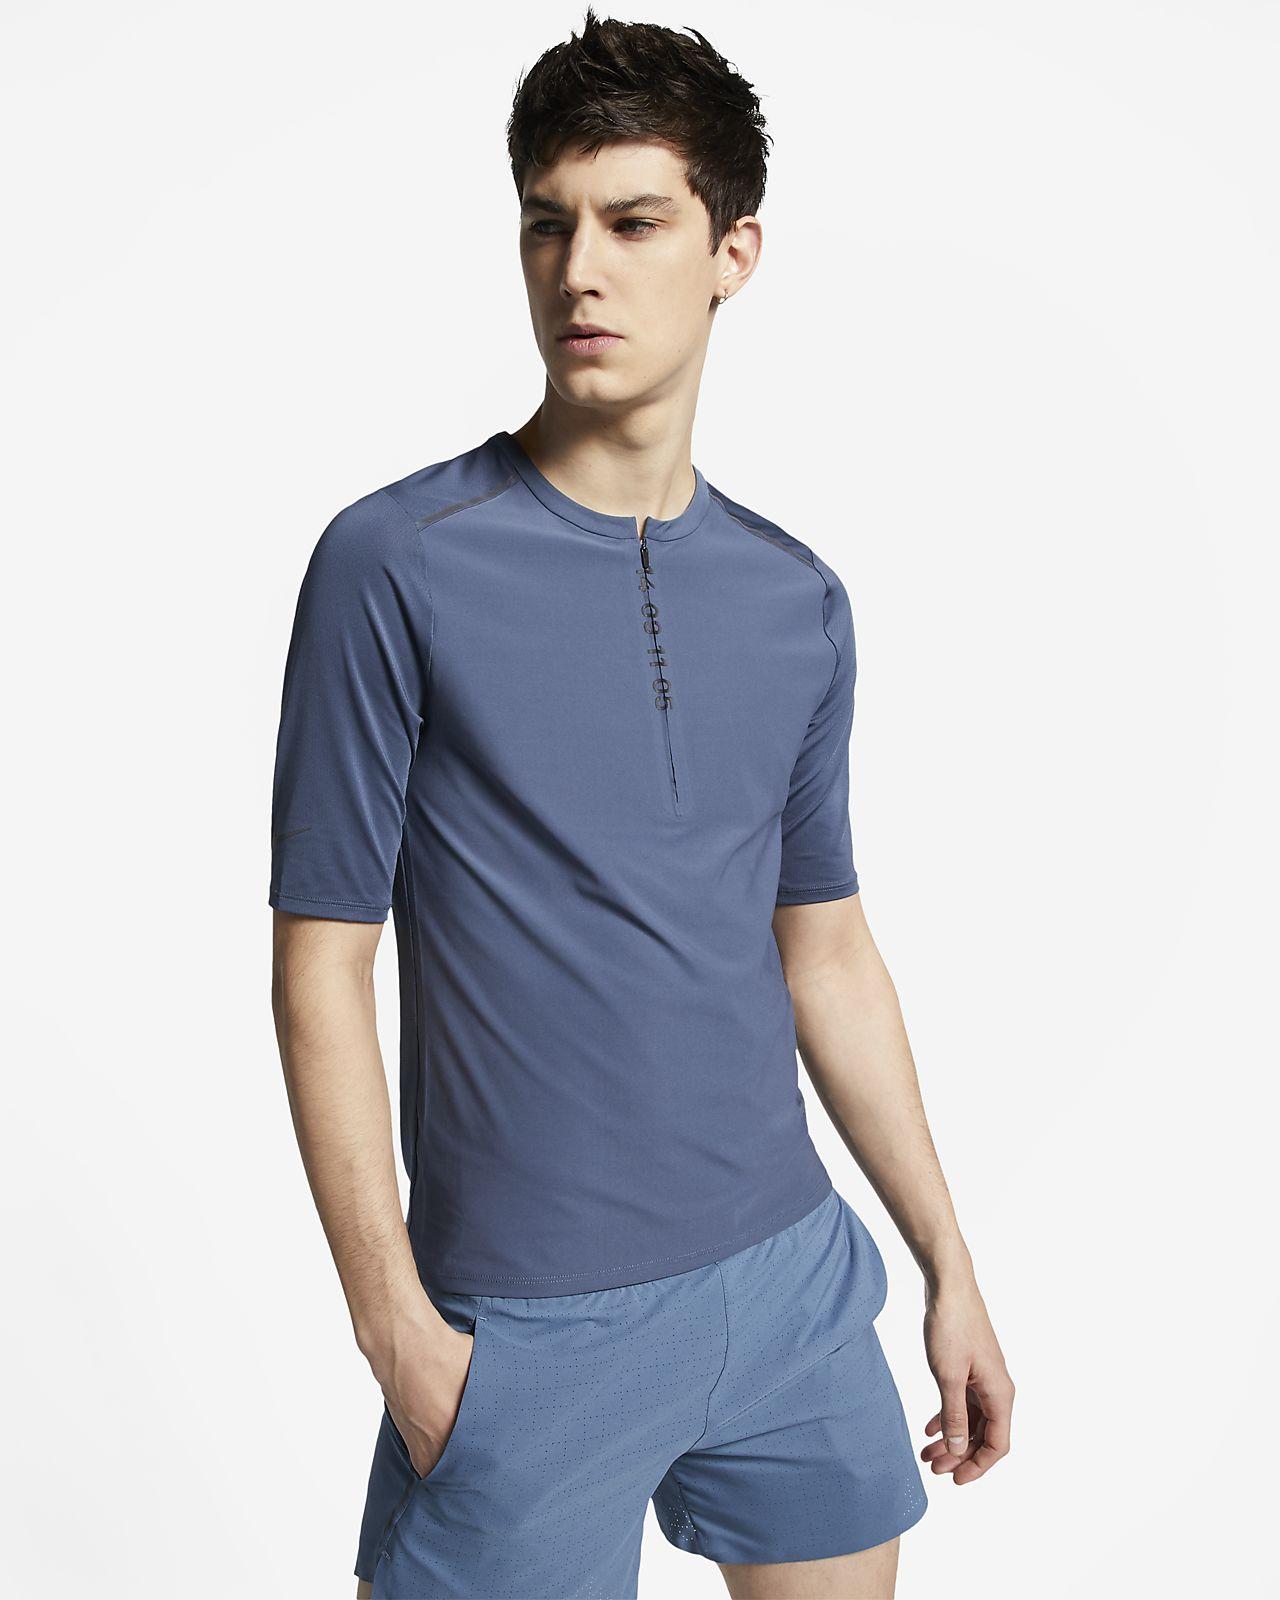 Nike Tech Pack Men's 1/2-Zip Short-Sleeve Running Top